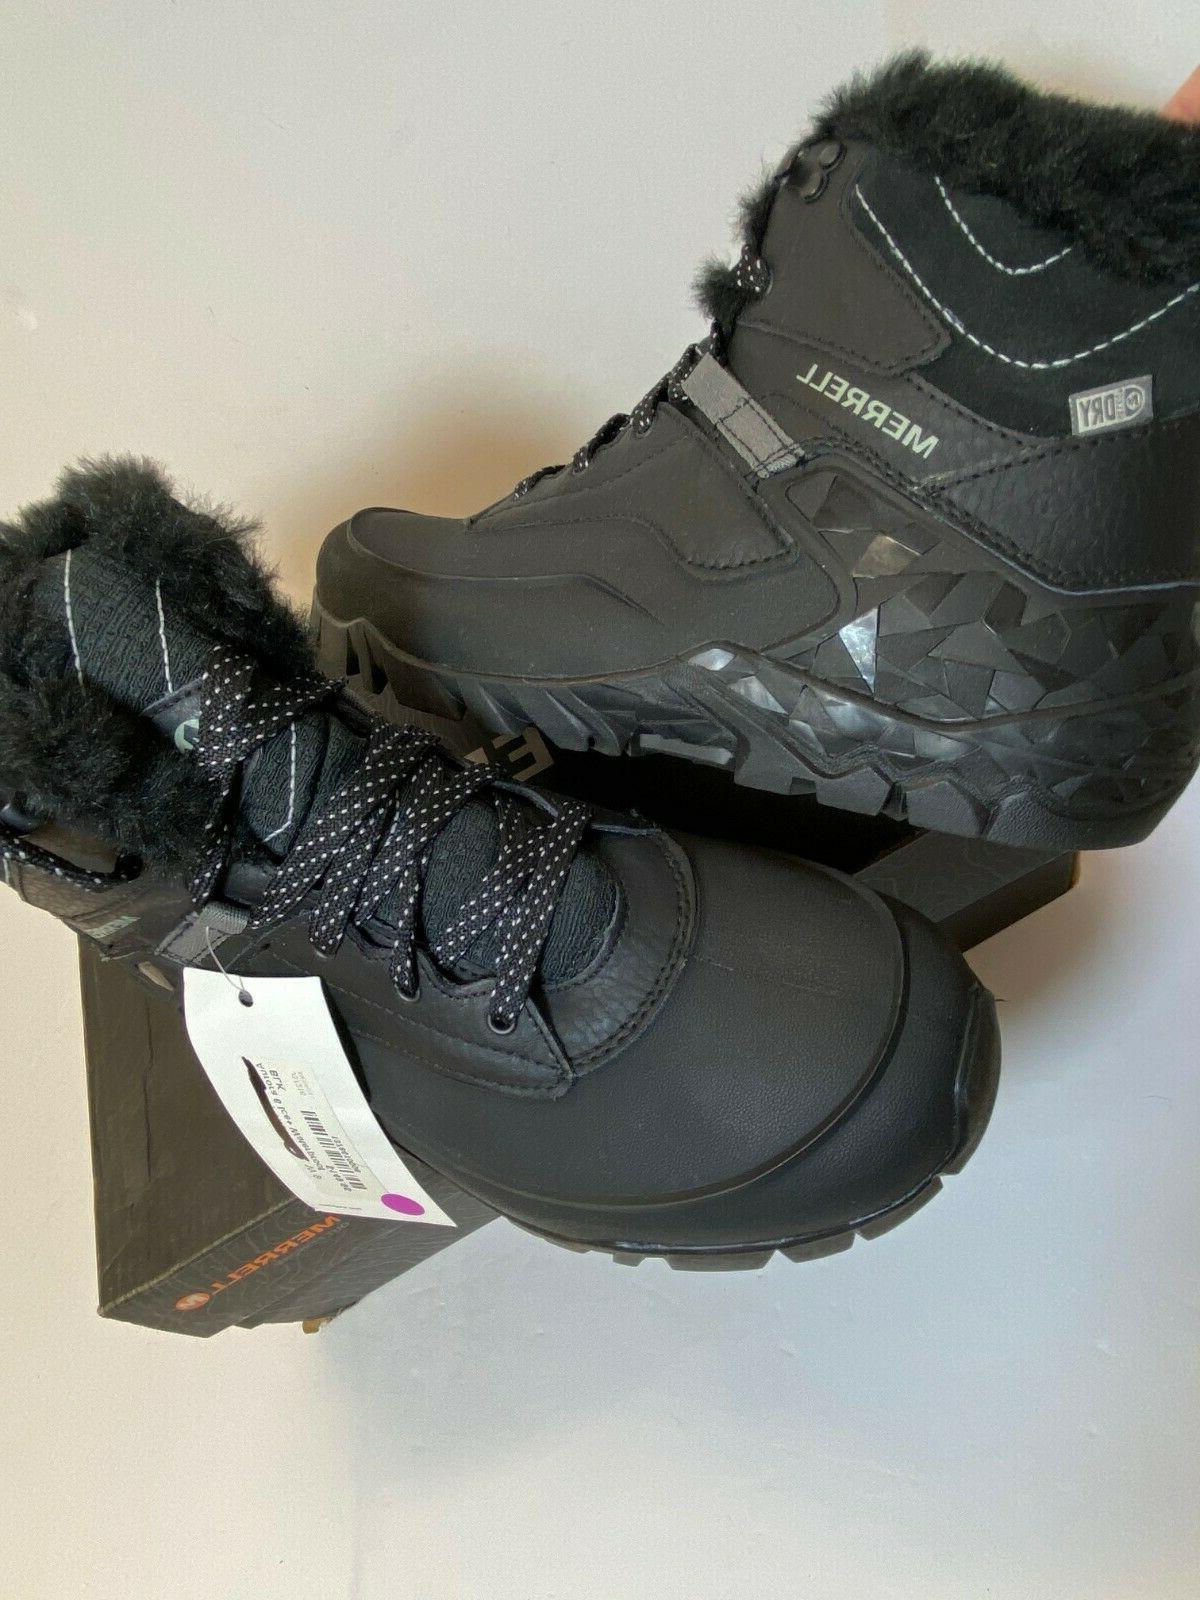 $150 Ice Women Thinsulate Blk